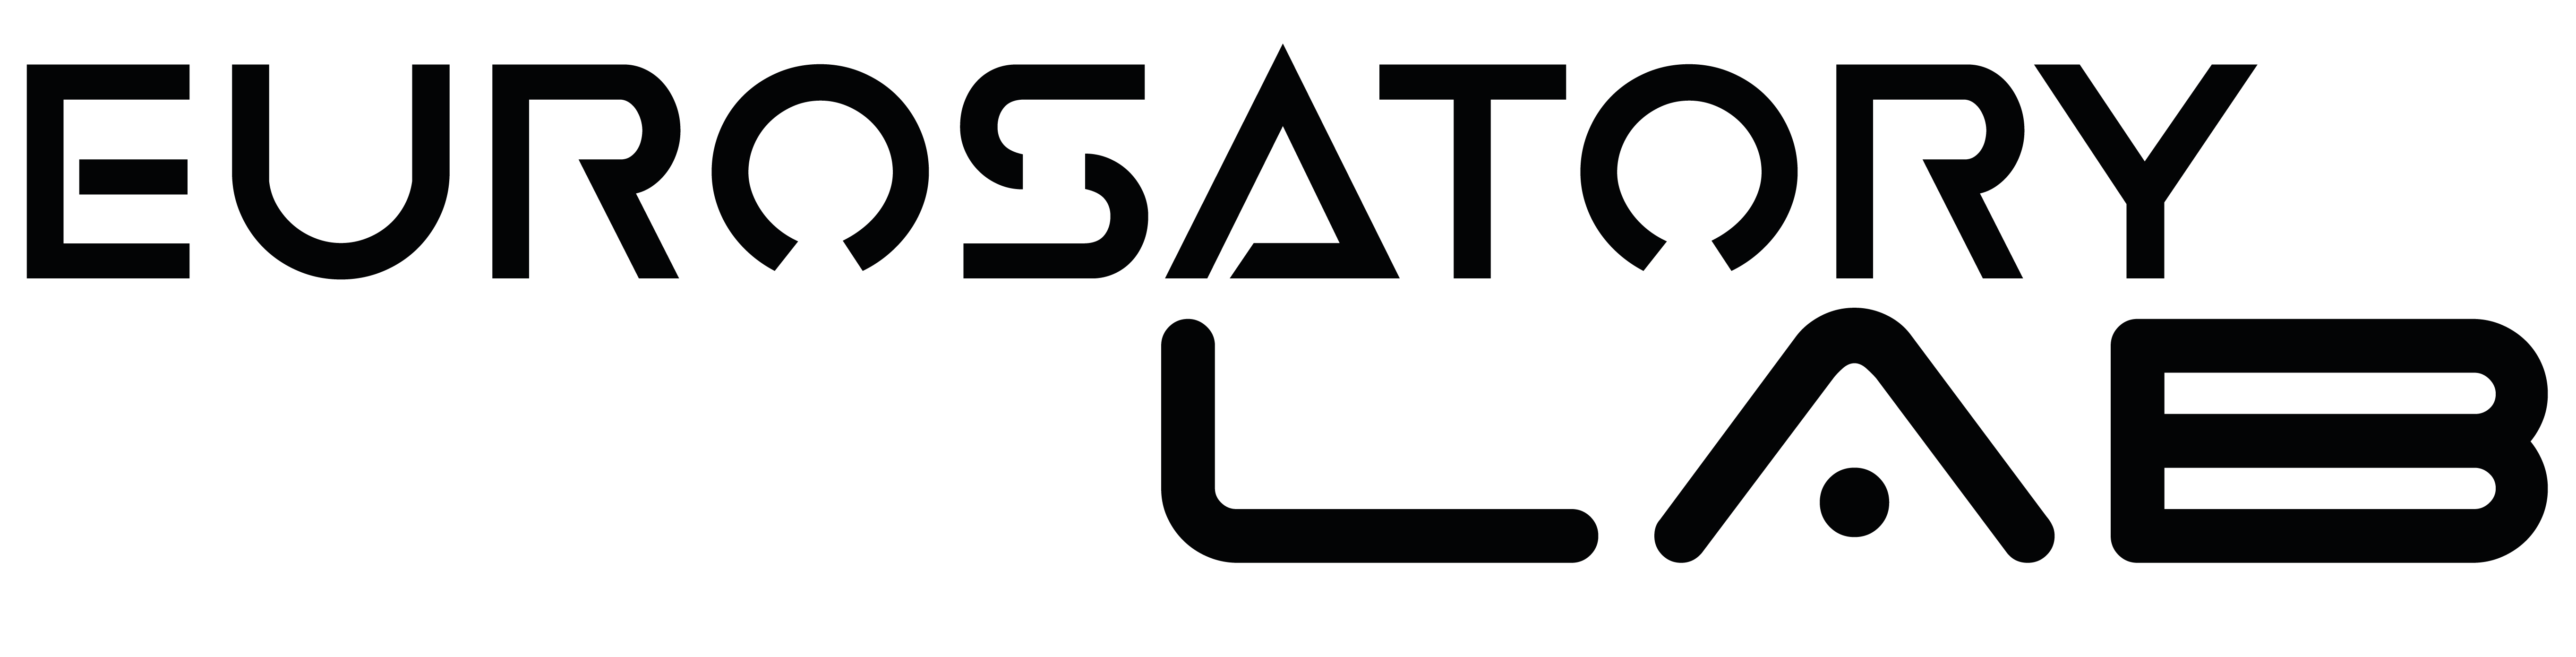 Logo_EurosatoryLab